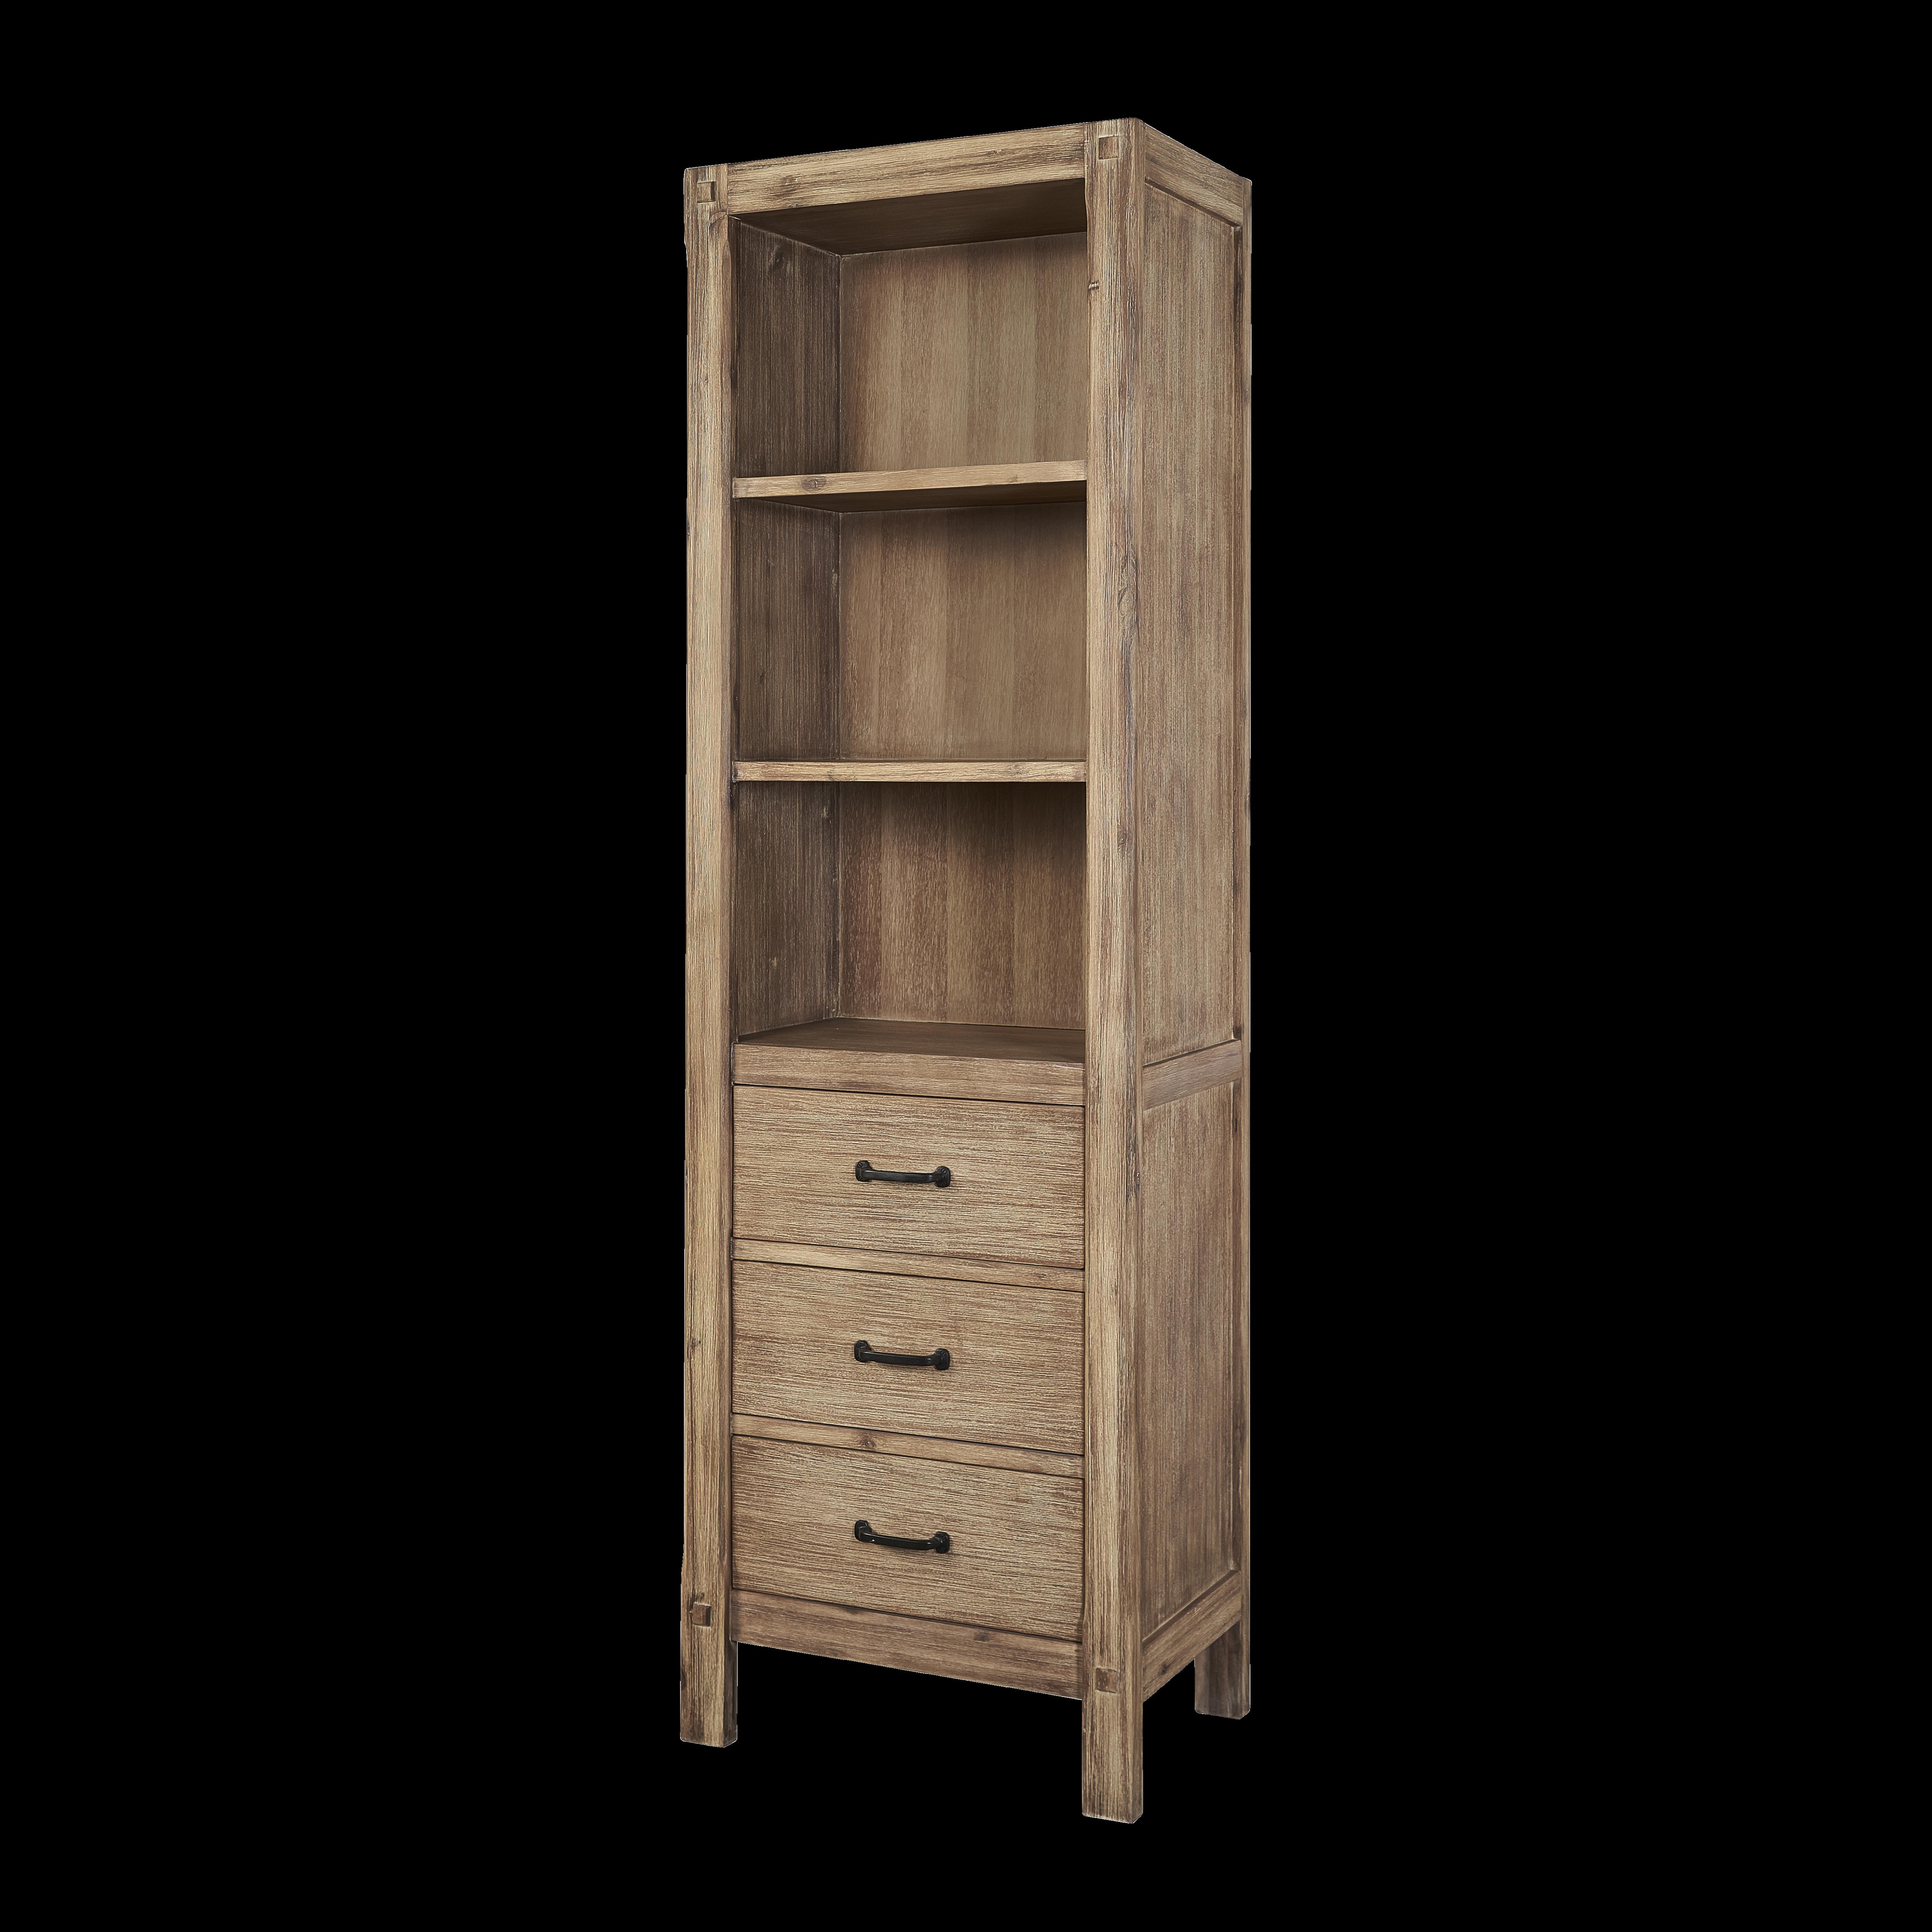 Fairmont Designs Vanities & Cabinets   QualityBath.com